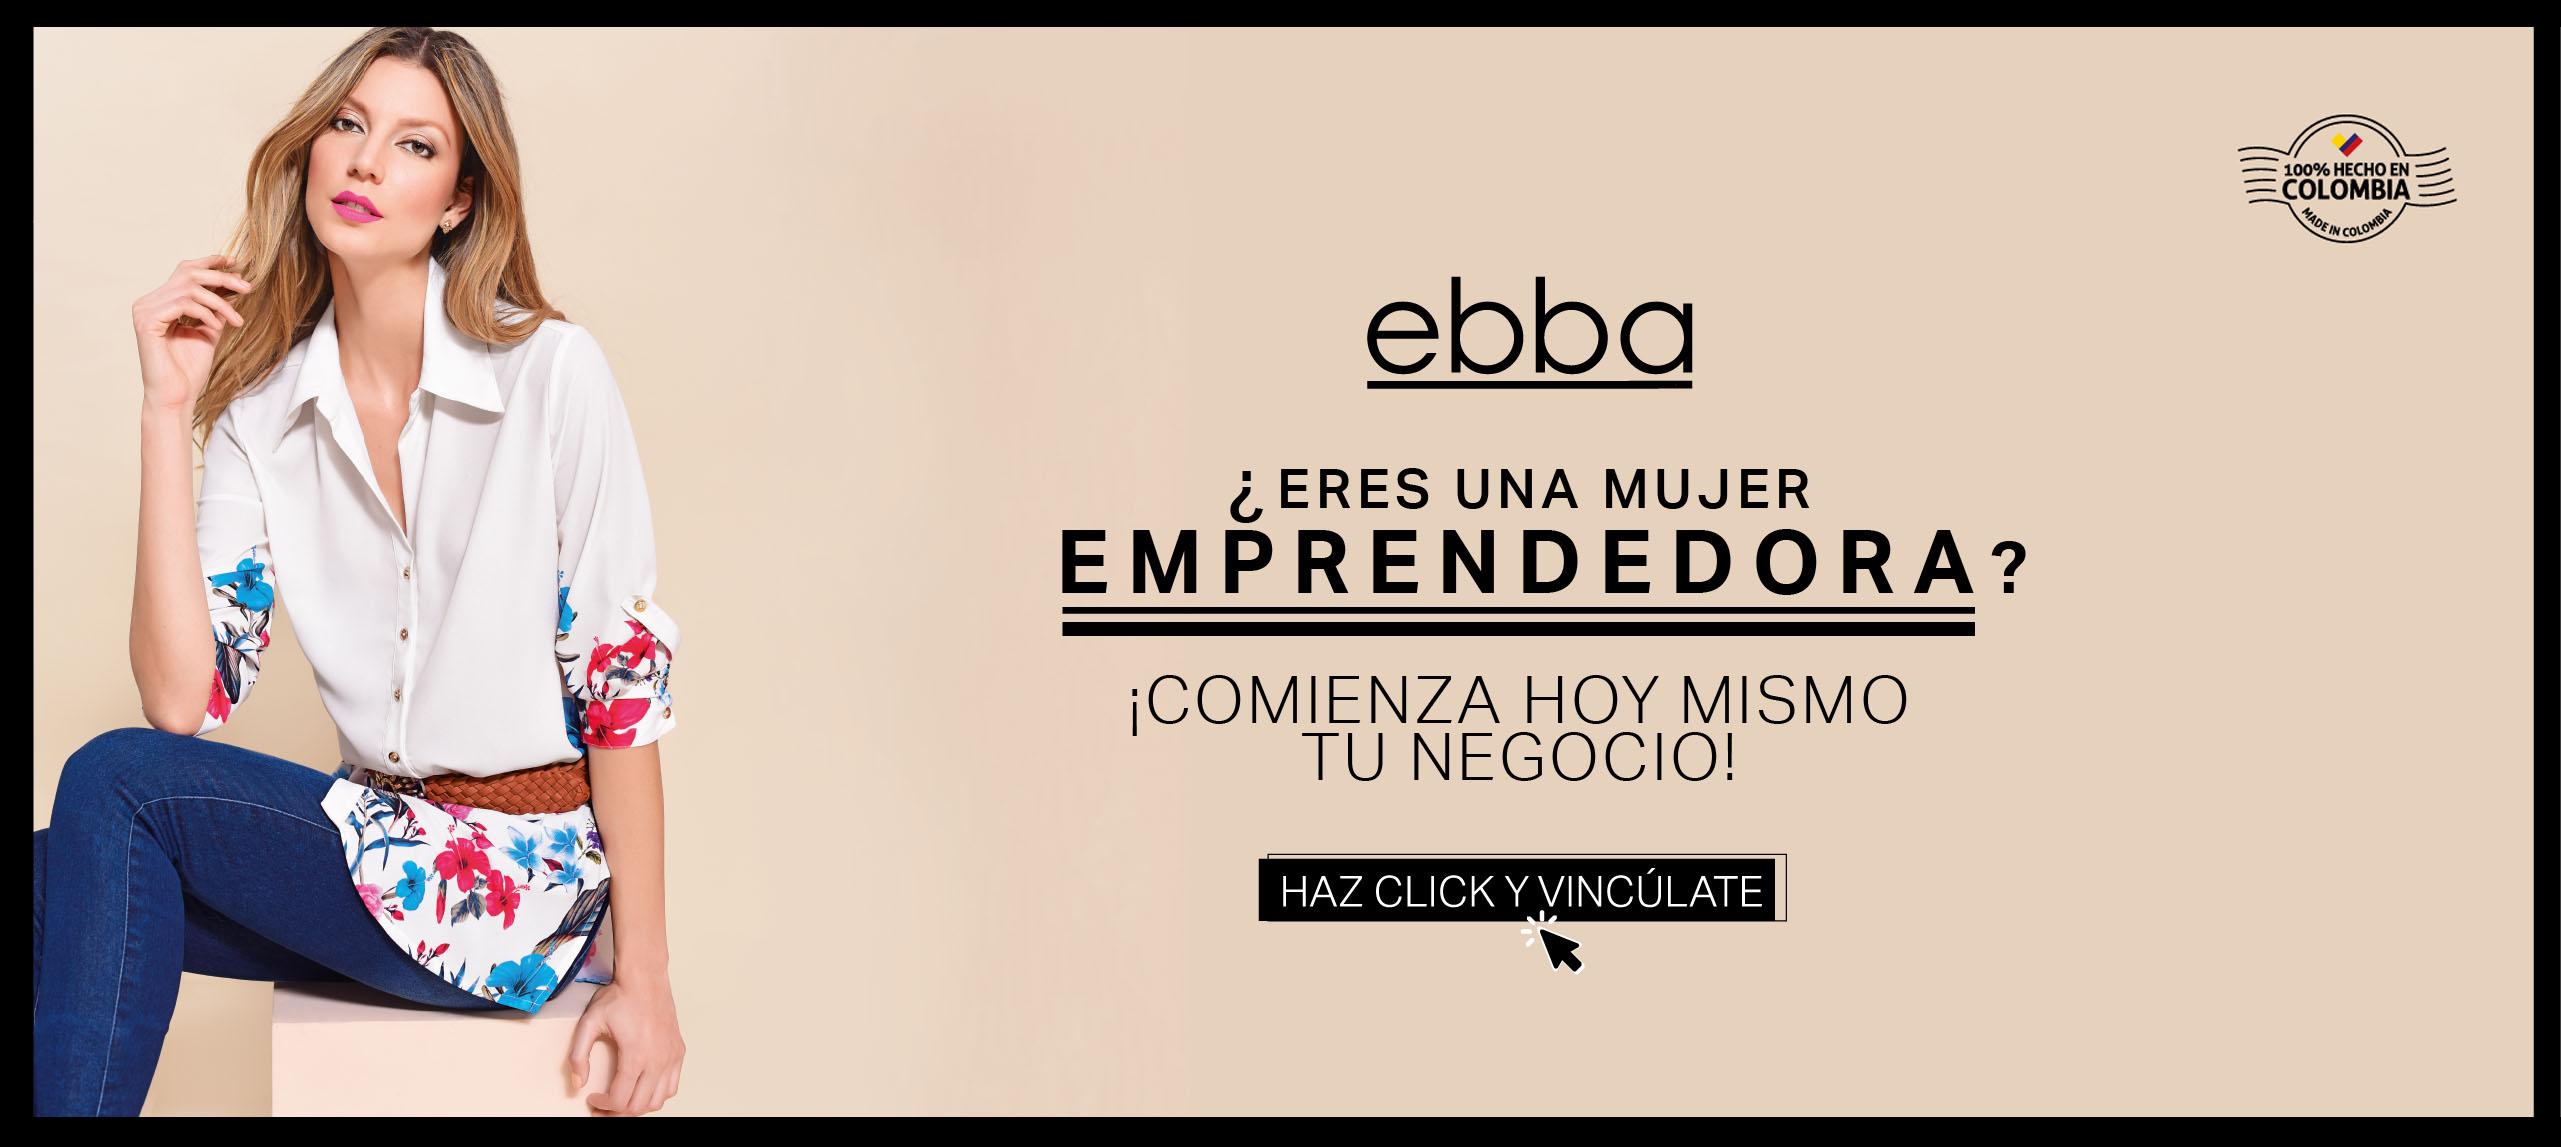 ebba-inicia-tu-negocio